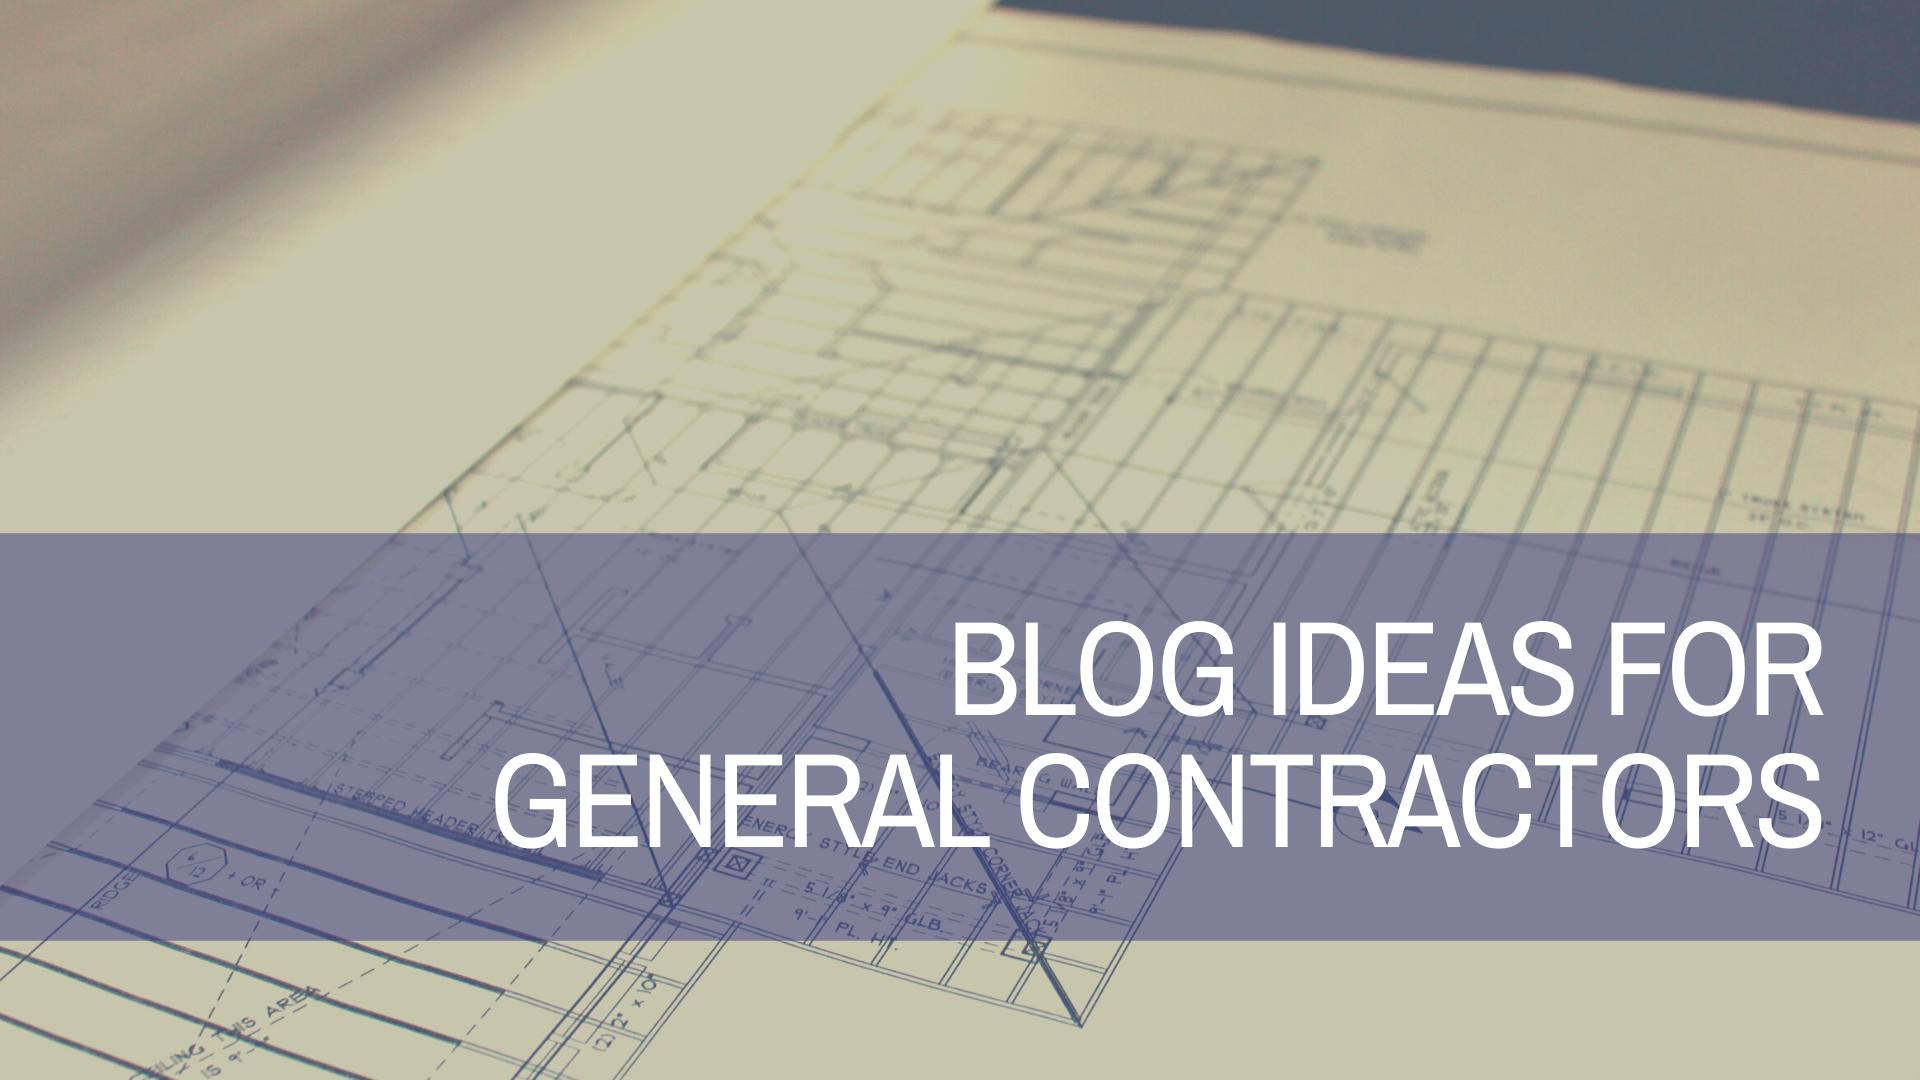 Blog Ideas for General Contractors | Amplihigher